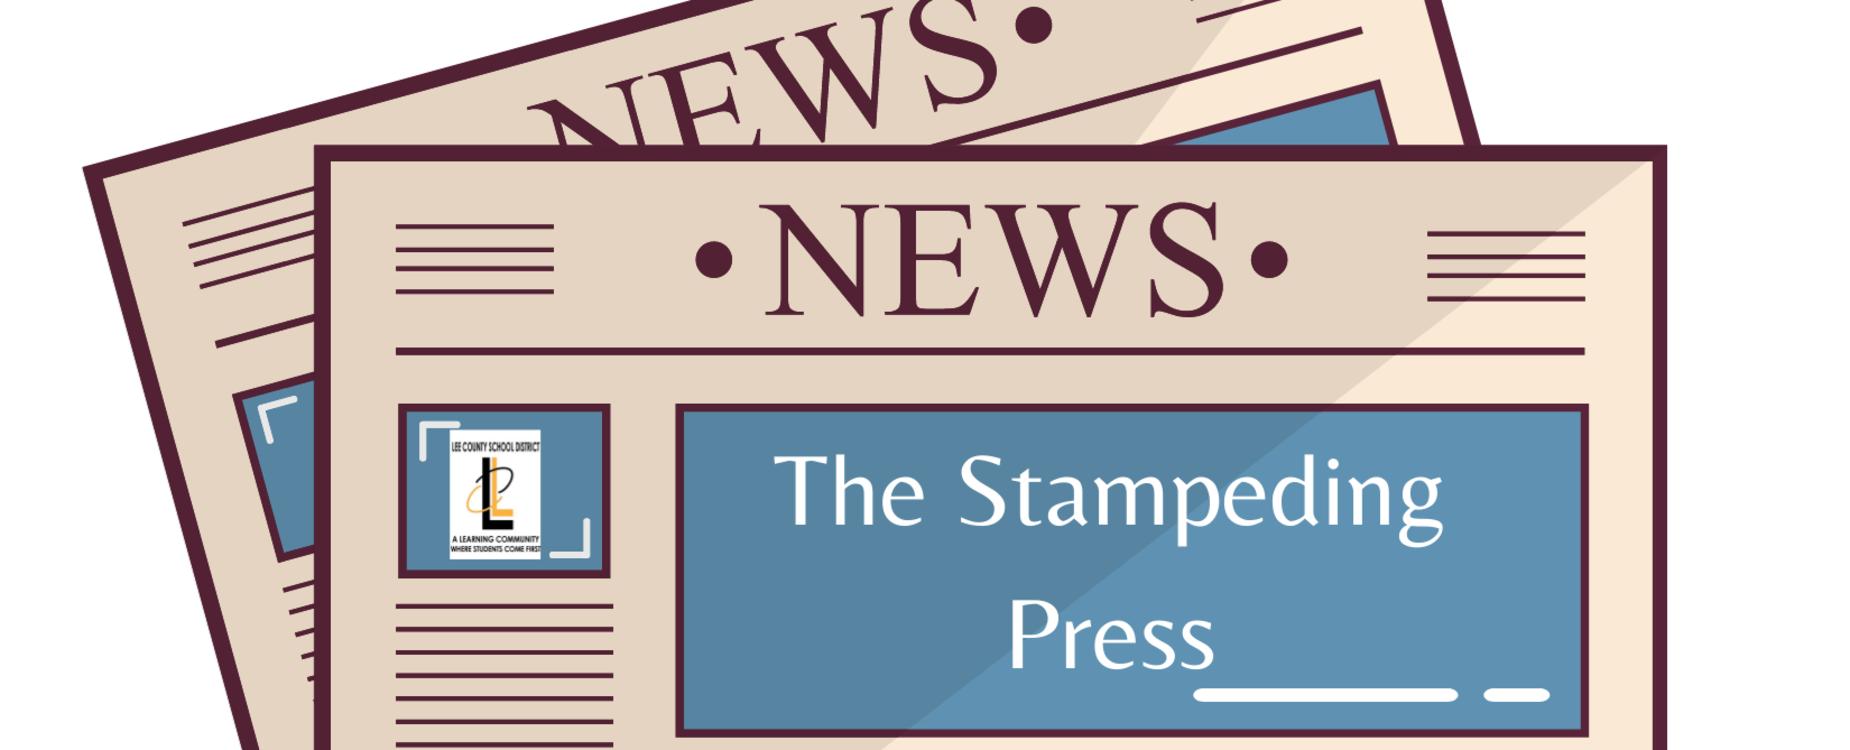 The Stampeding Press